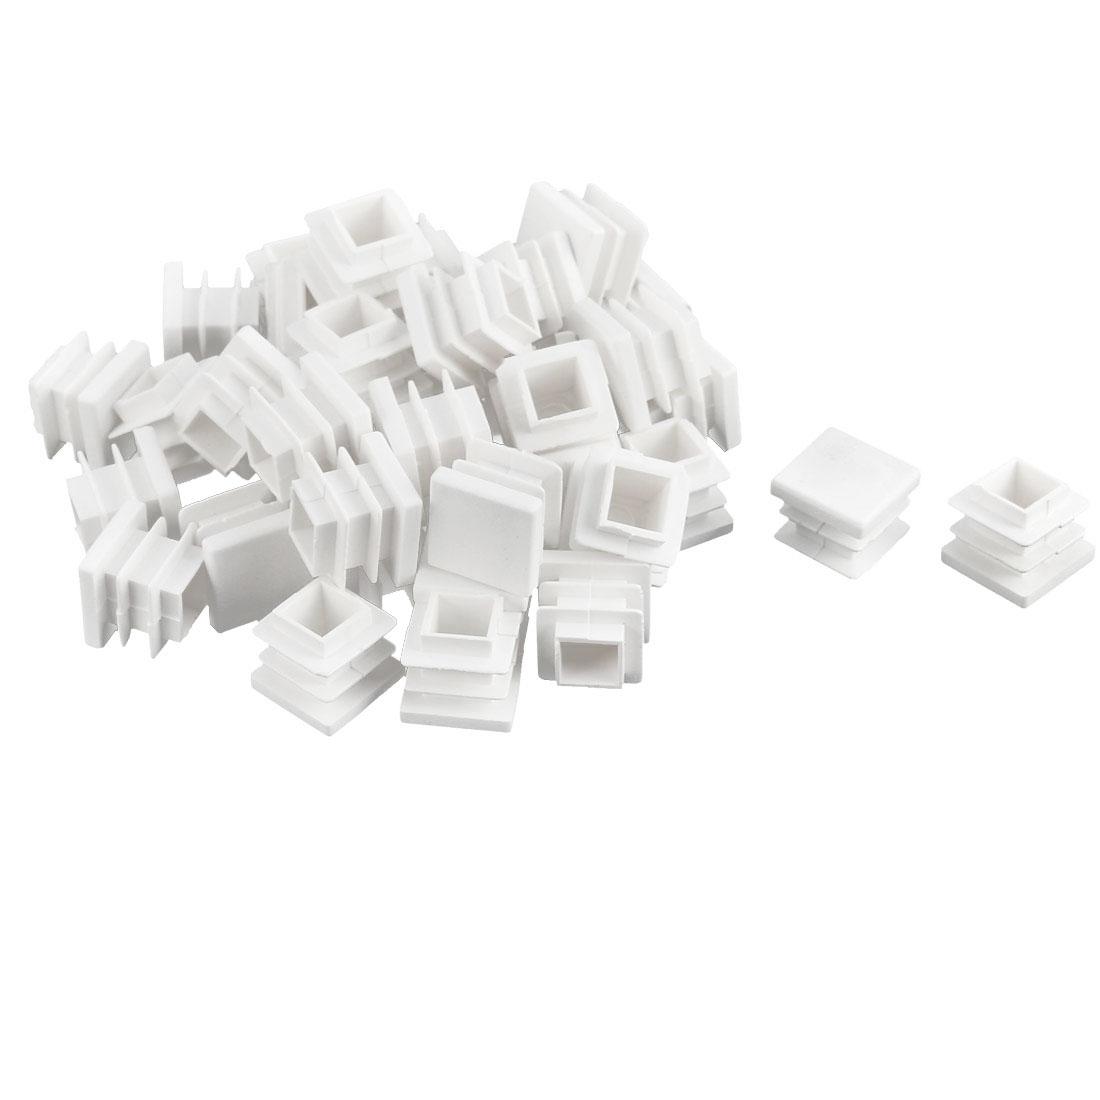 Furniture Desk Chair Legs Plastic Square Tube Pipe Insert Cover End Caps White 16 x 16mm 40pcs